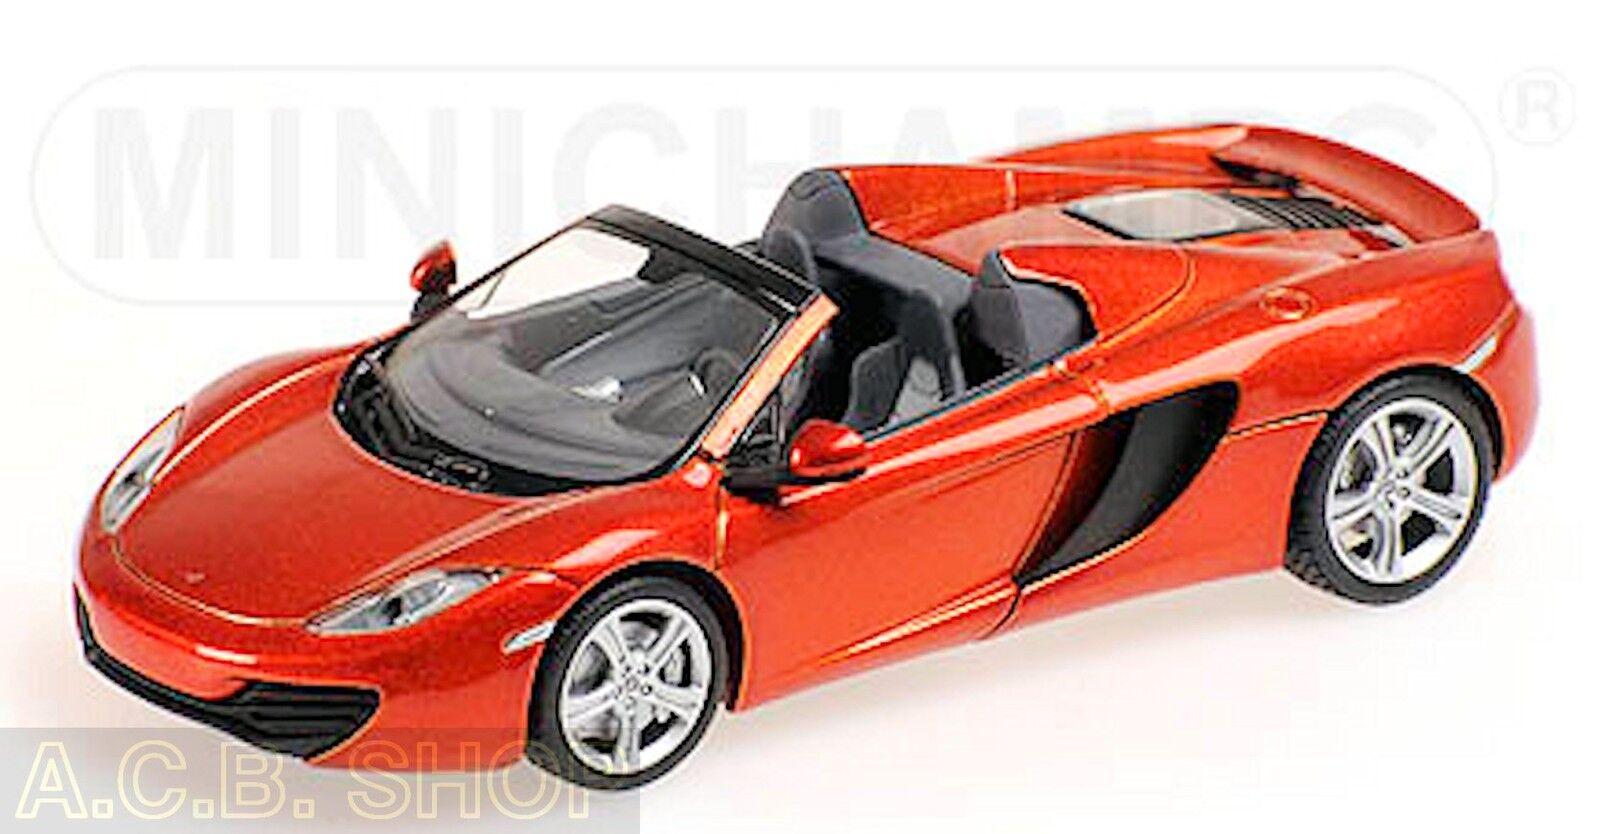 McLaren mp4-12c Spider 2012 Orange Metallic 1 43 Minichamps